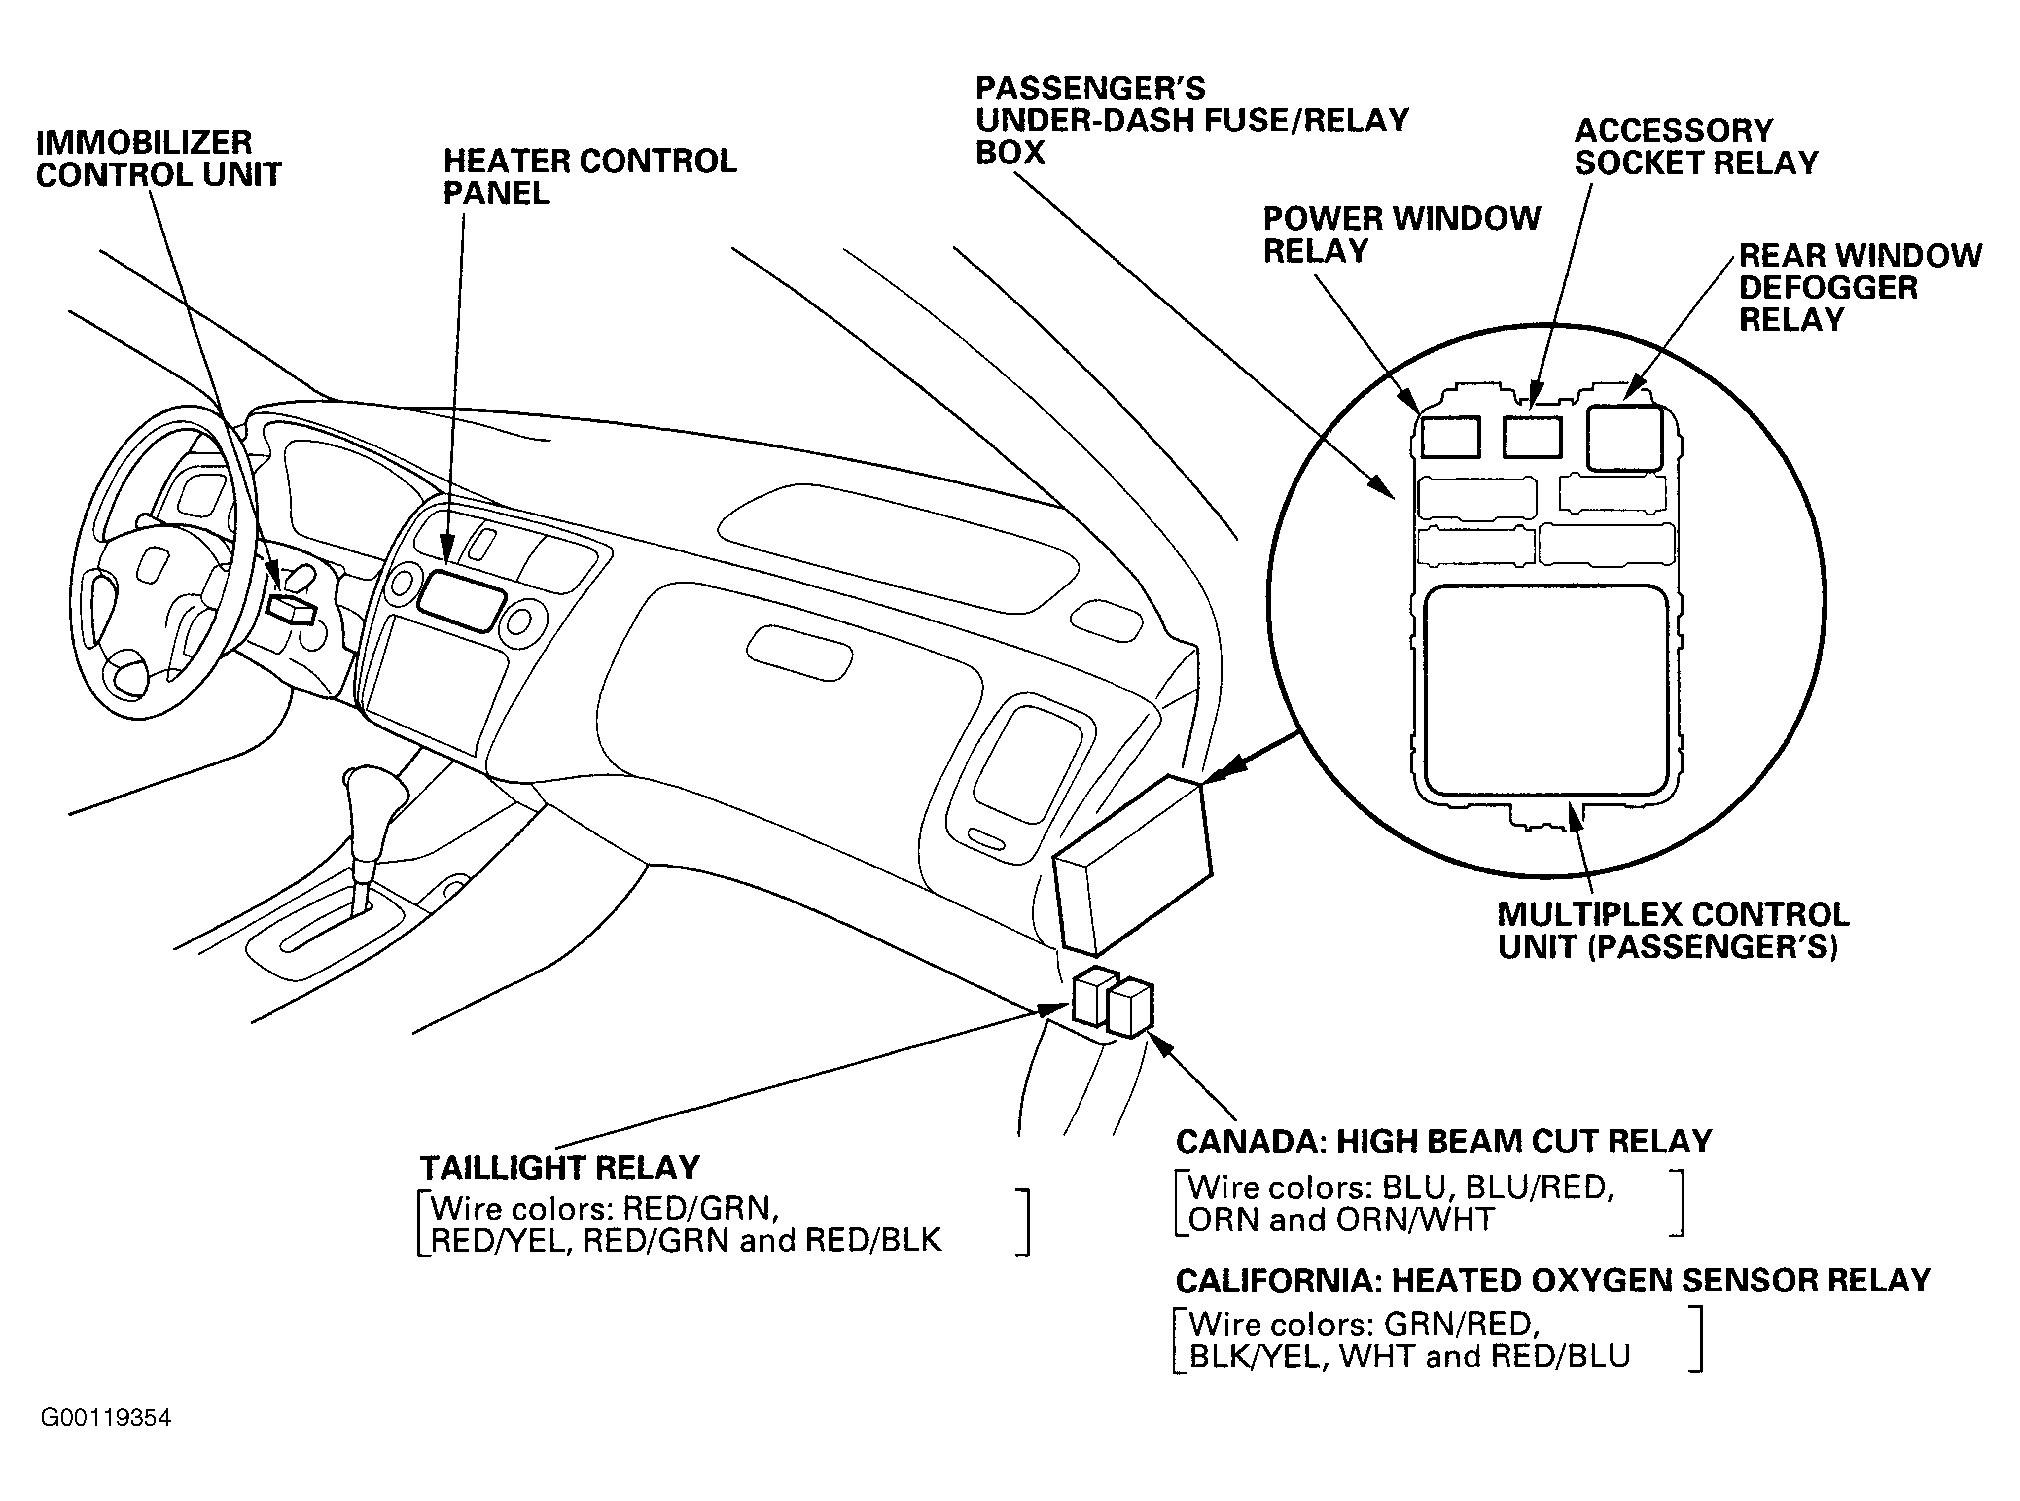 2001 Mustang Wiring Diagram Honda Civic Main Relay ...